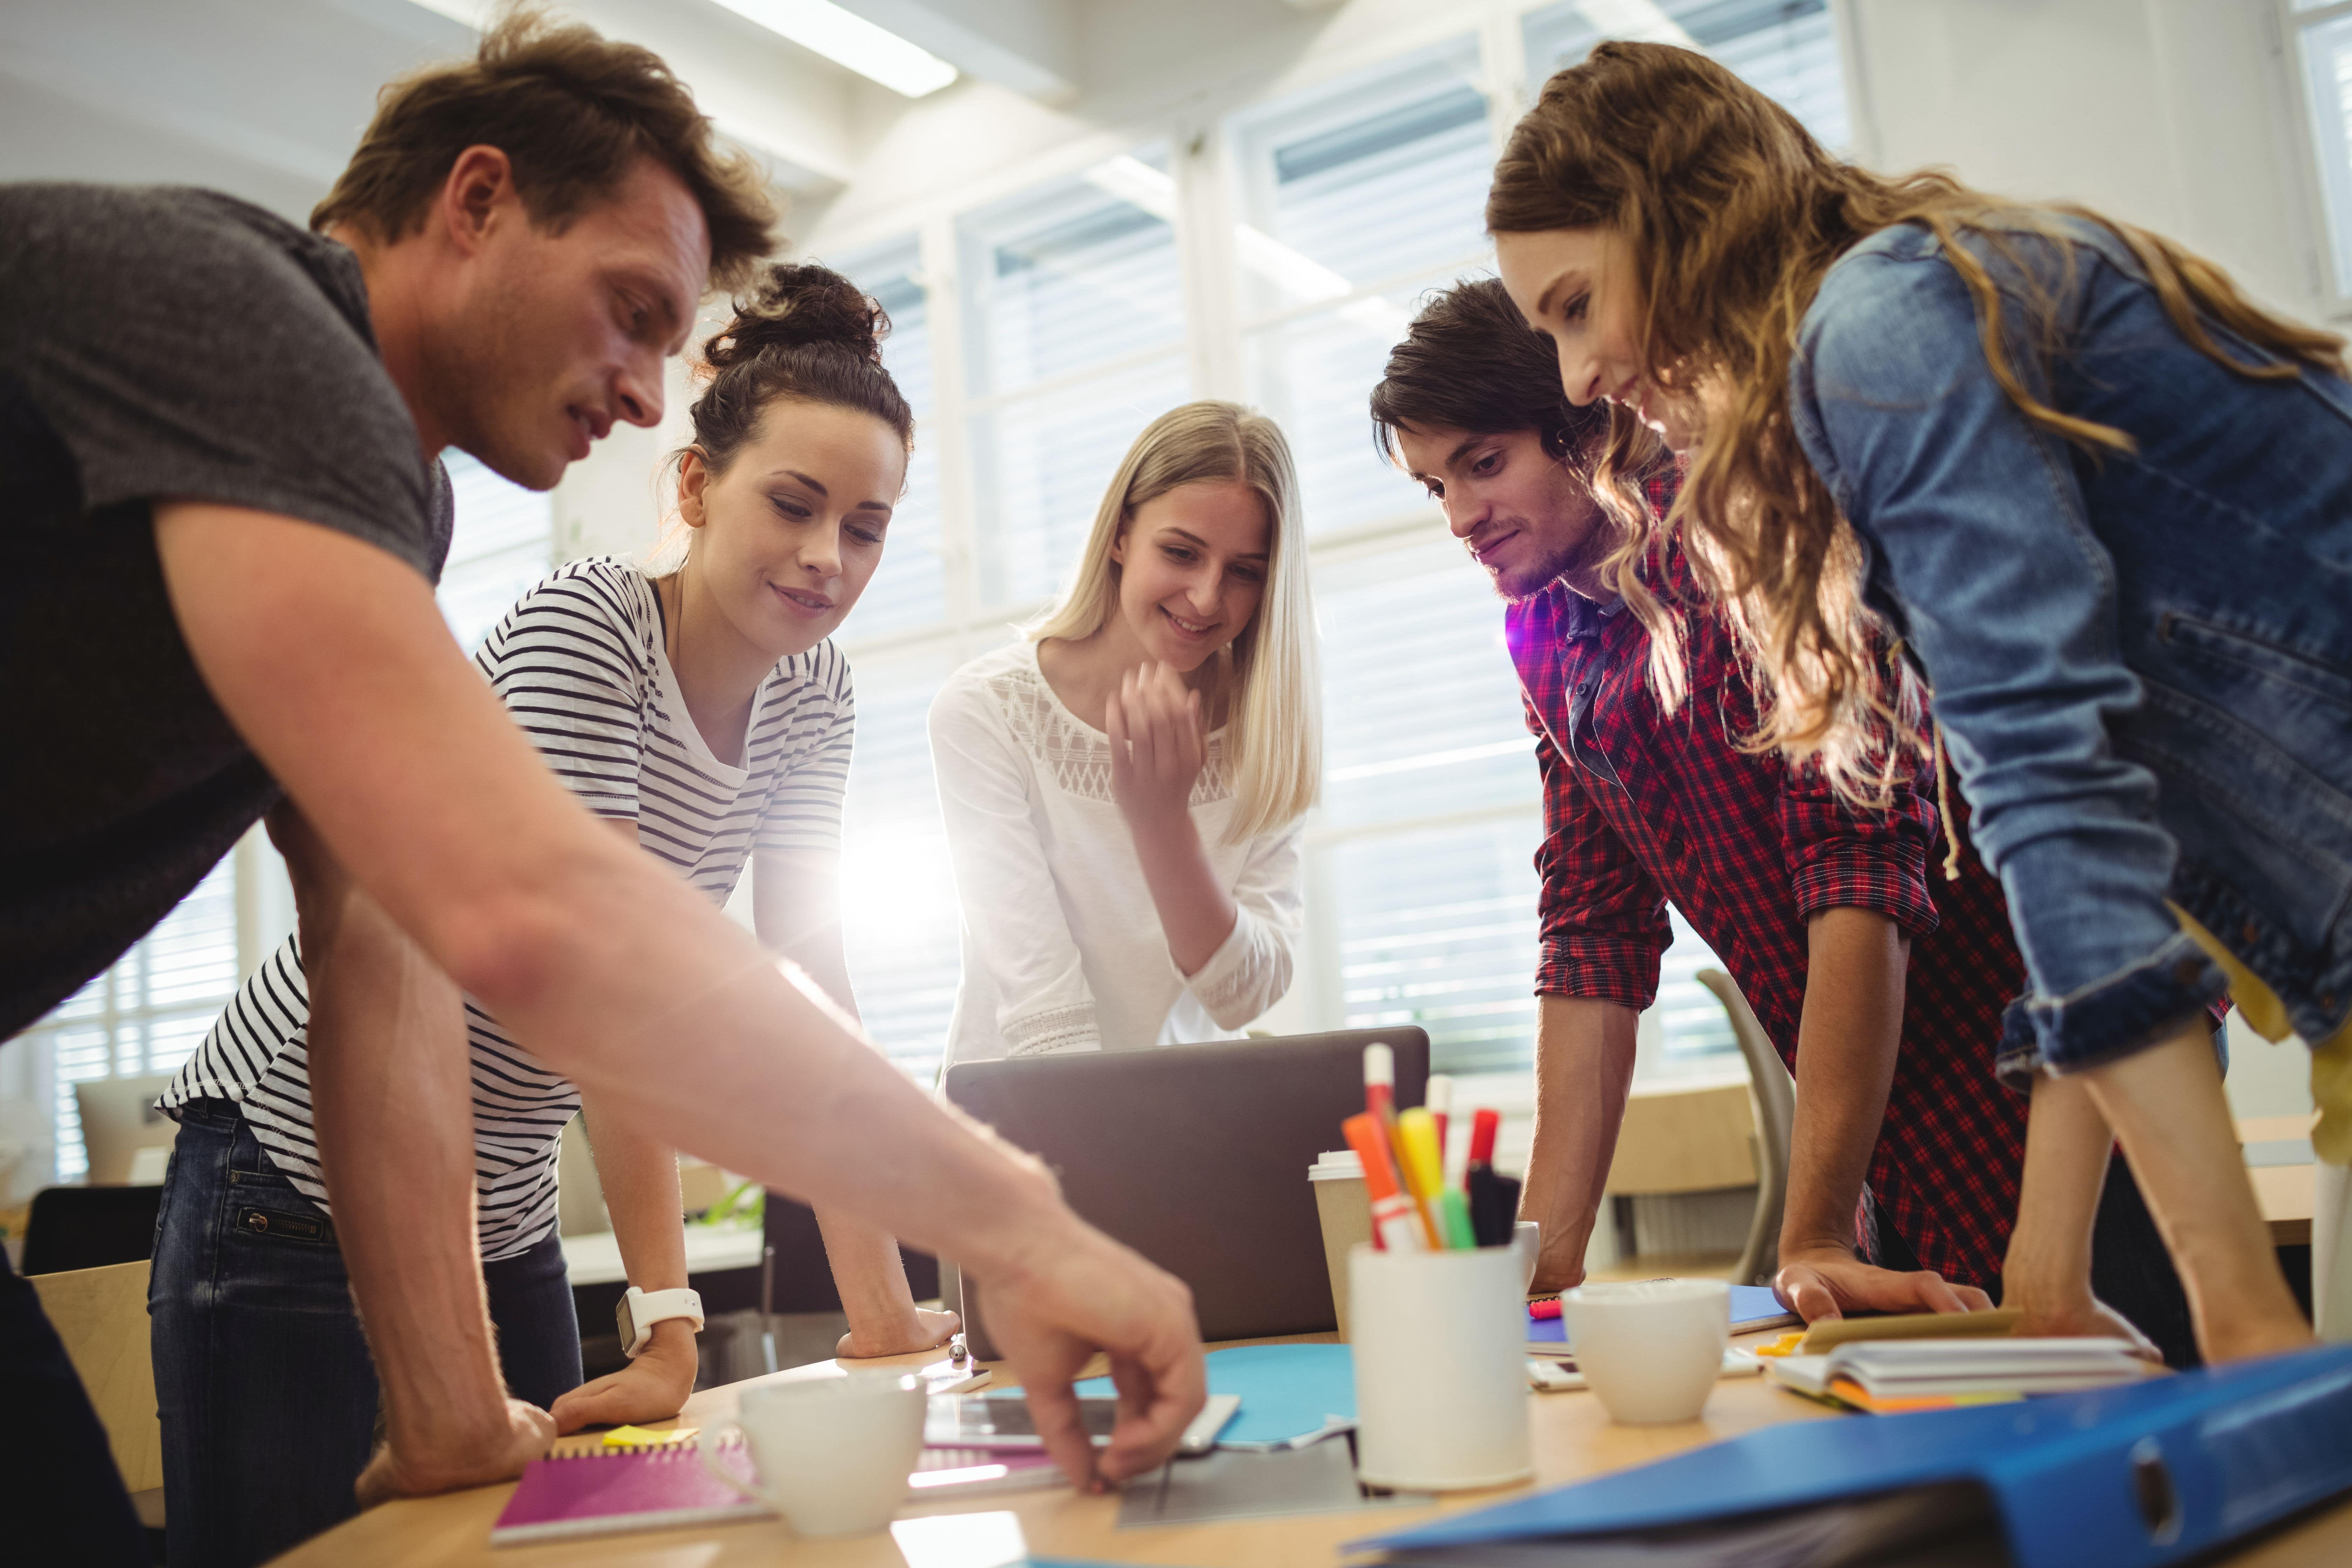 Effective team communication? Focus on quality! • ScienceForWork